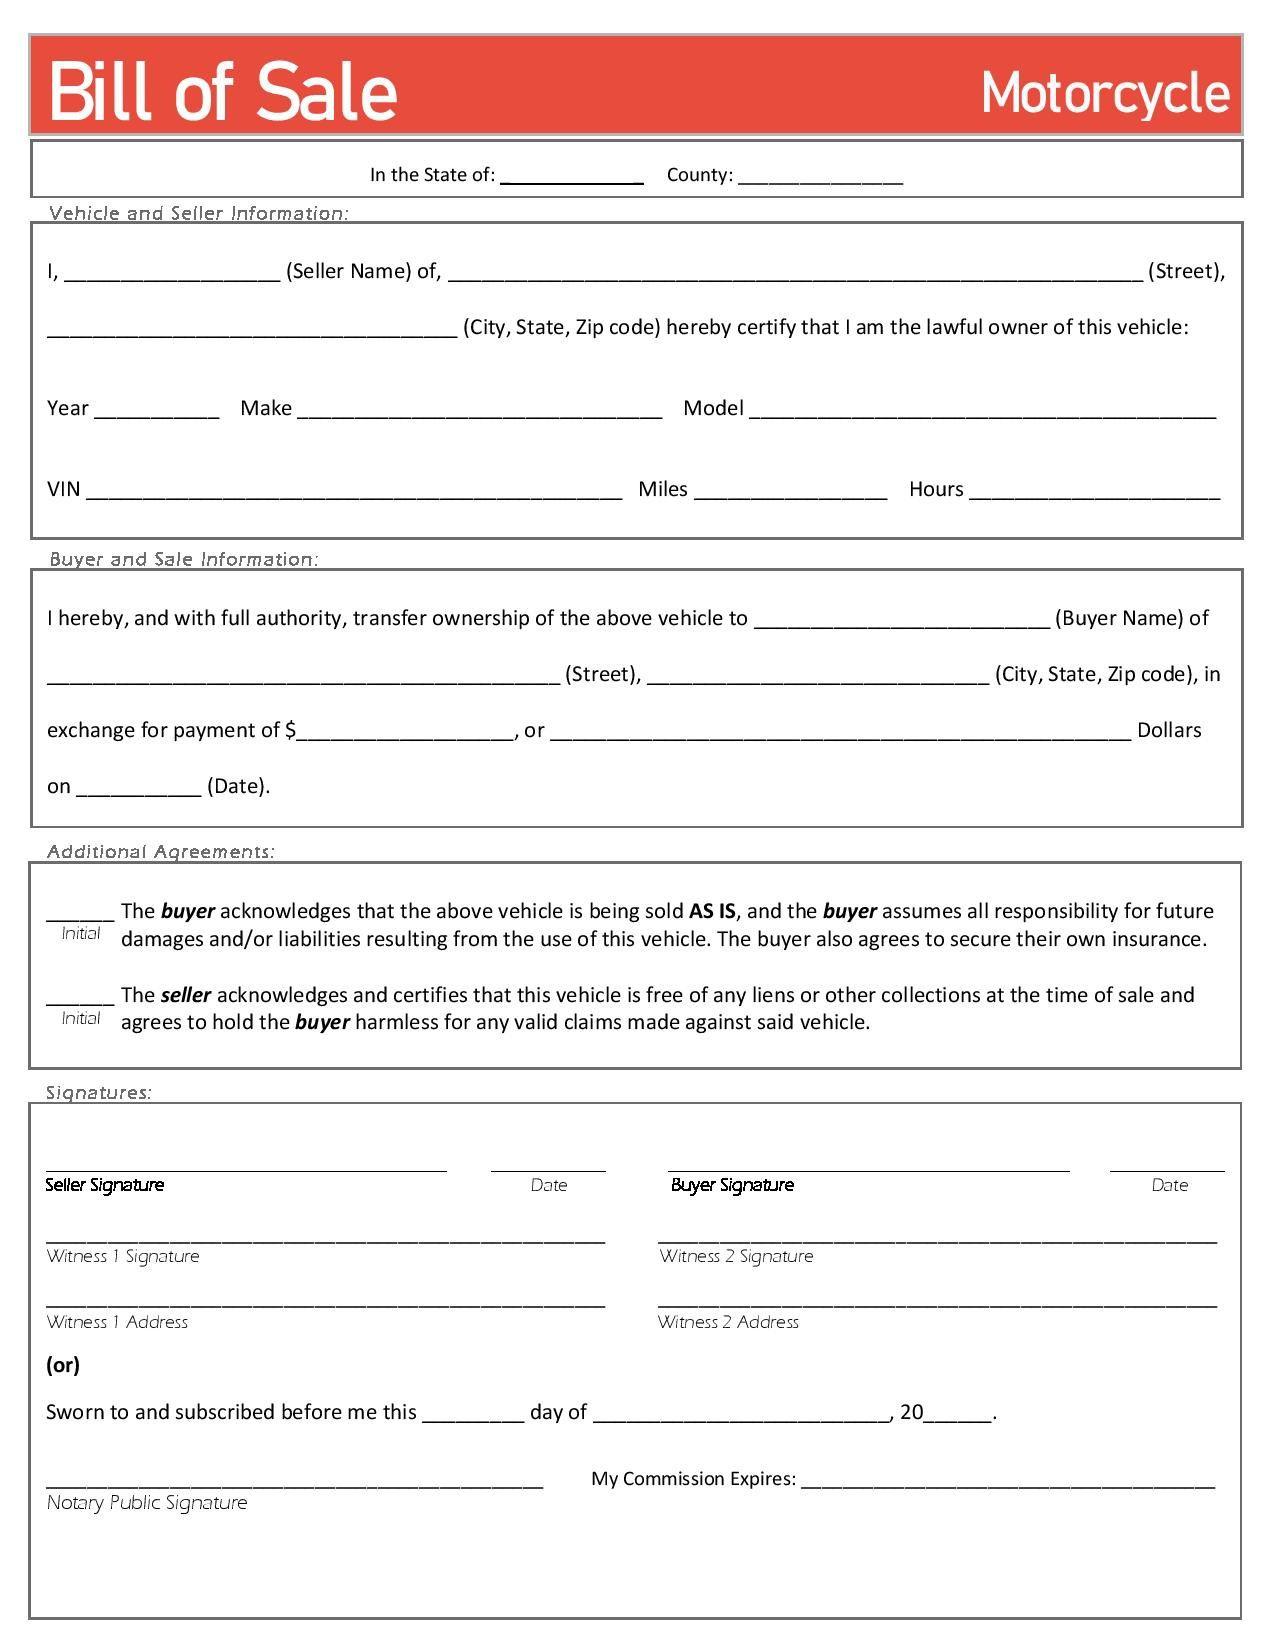 002 Sensational Bill Of Sale Template Texa Highest Quality  Texas Free Car Form Dmv DocumentFull